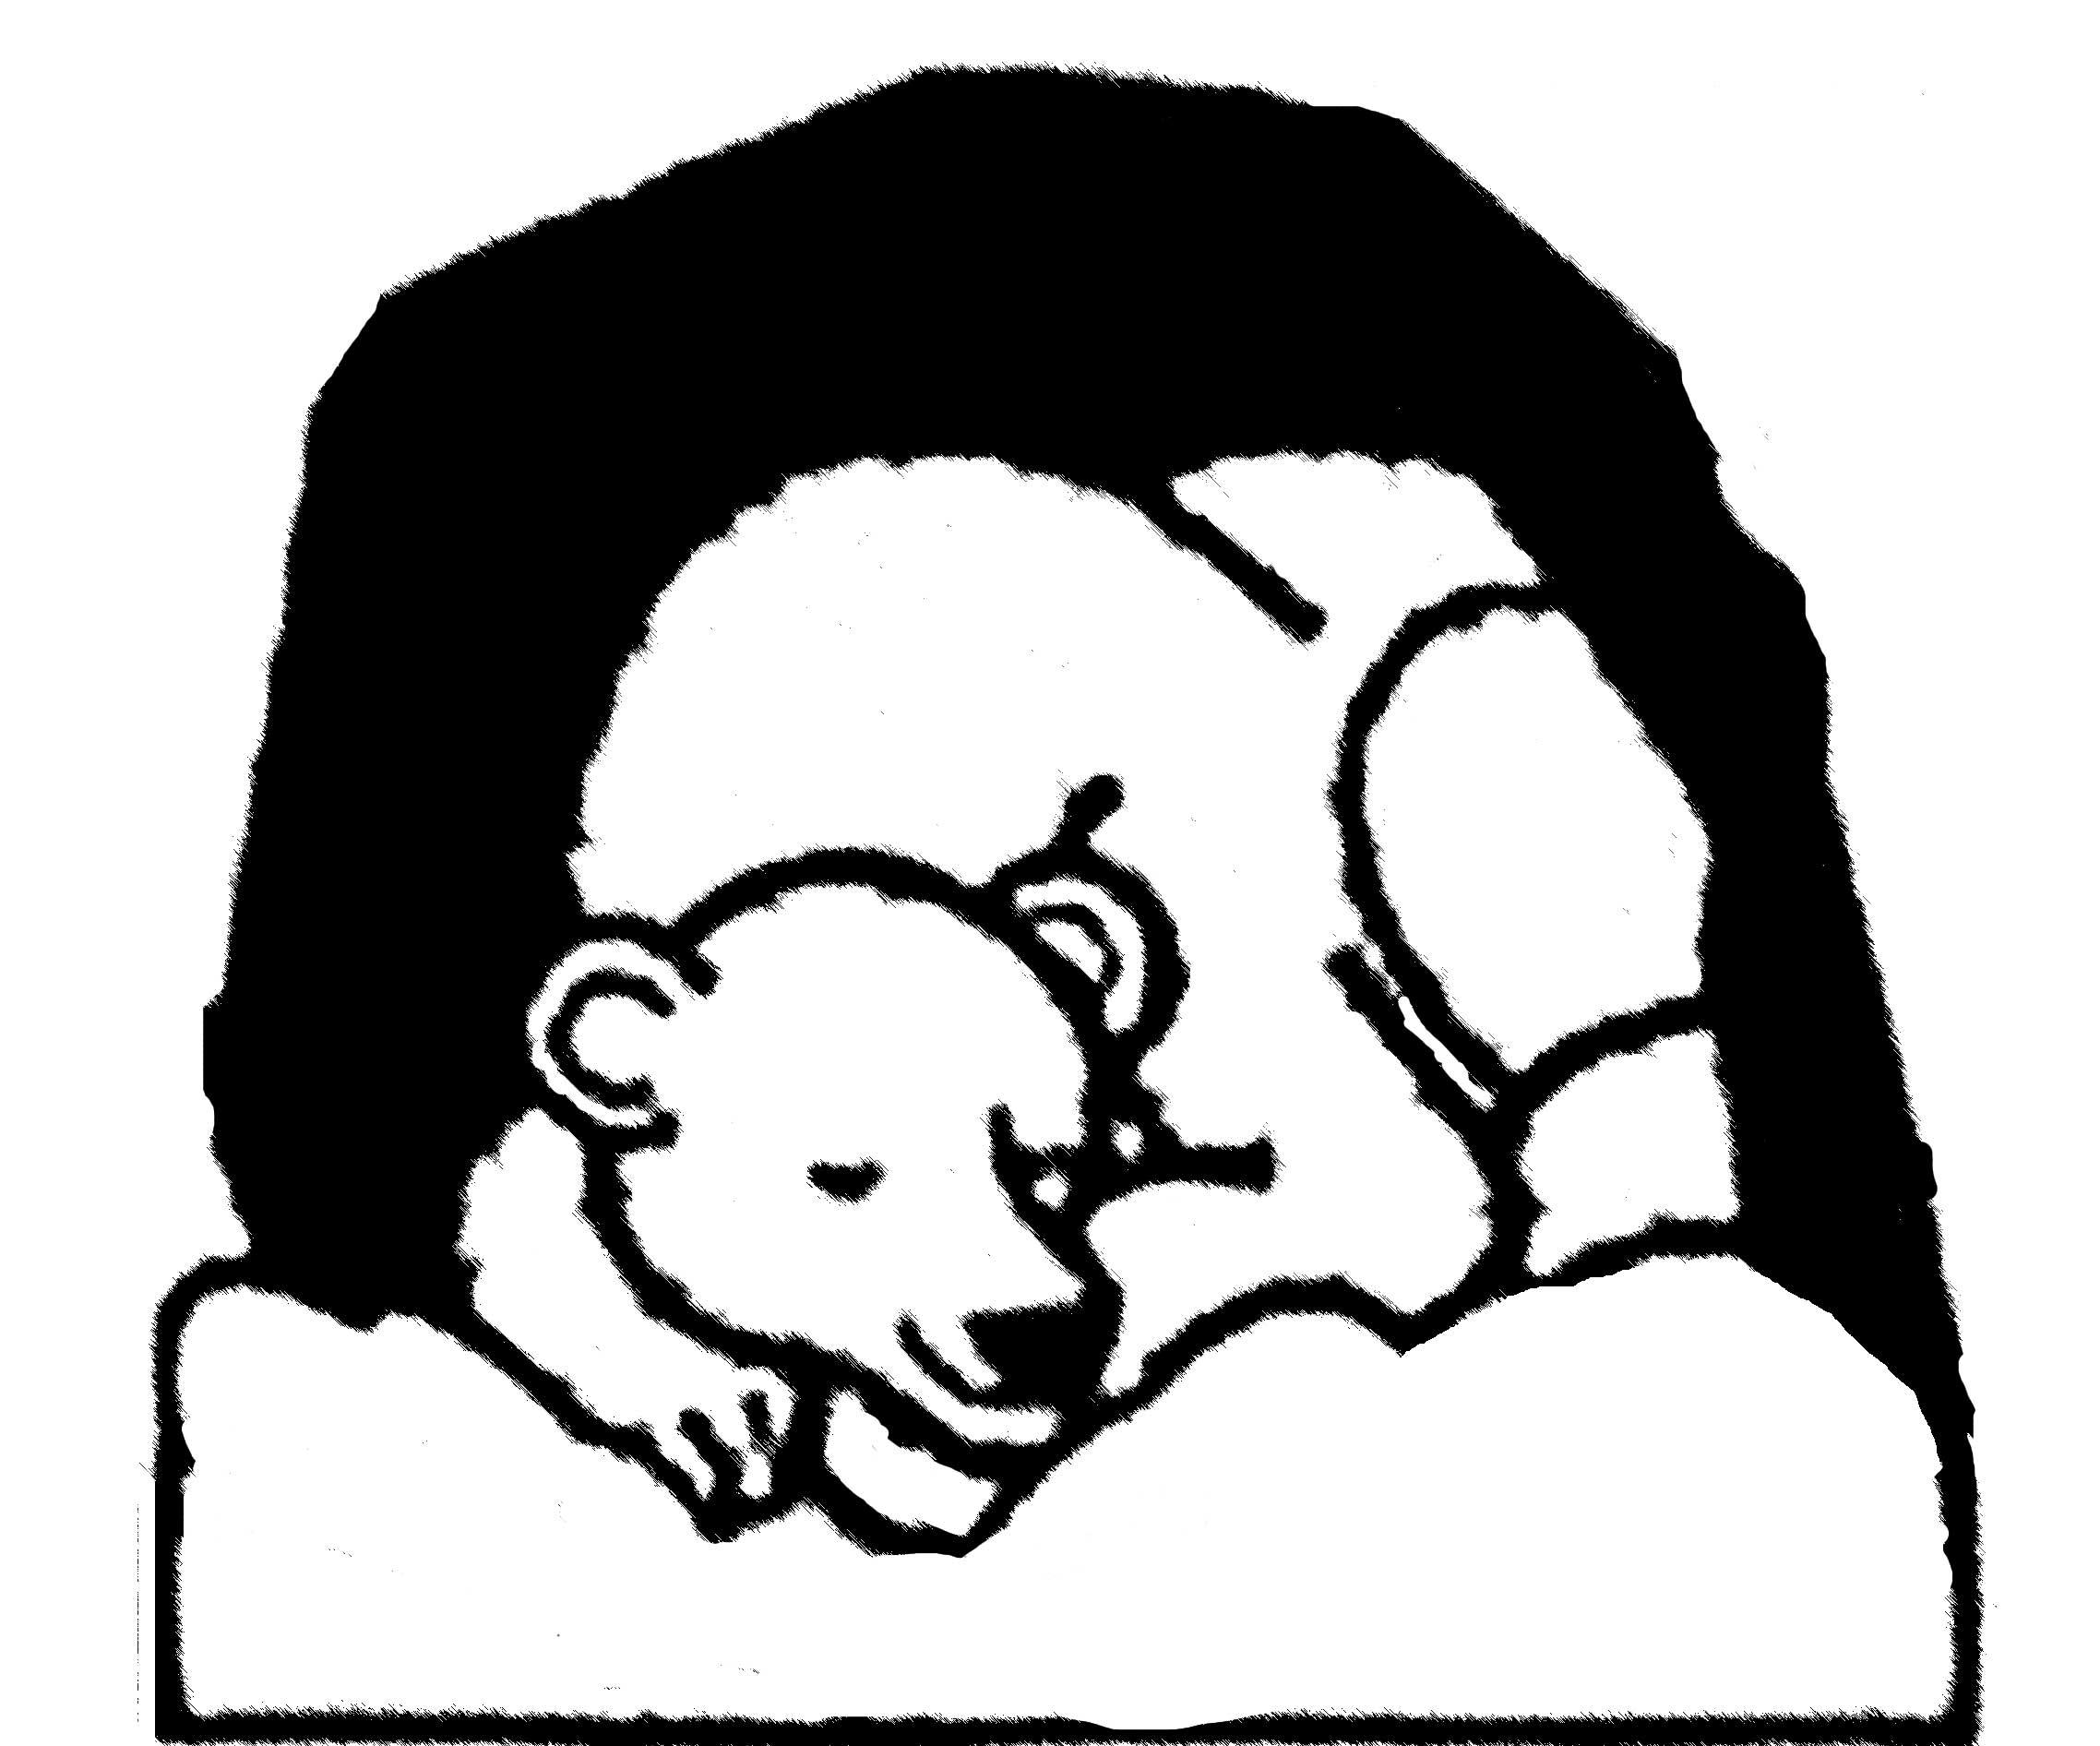 Free Sleeping Bear Clipart, Download Free Clip Art, Free ...